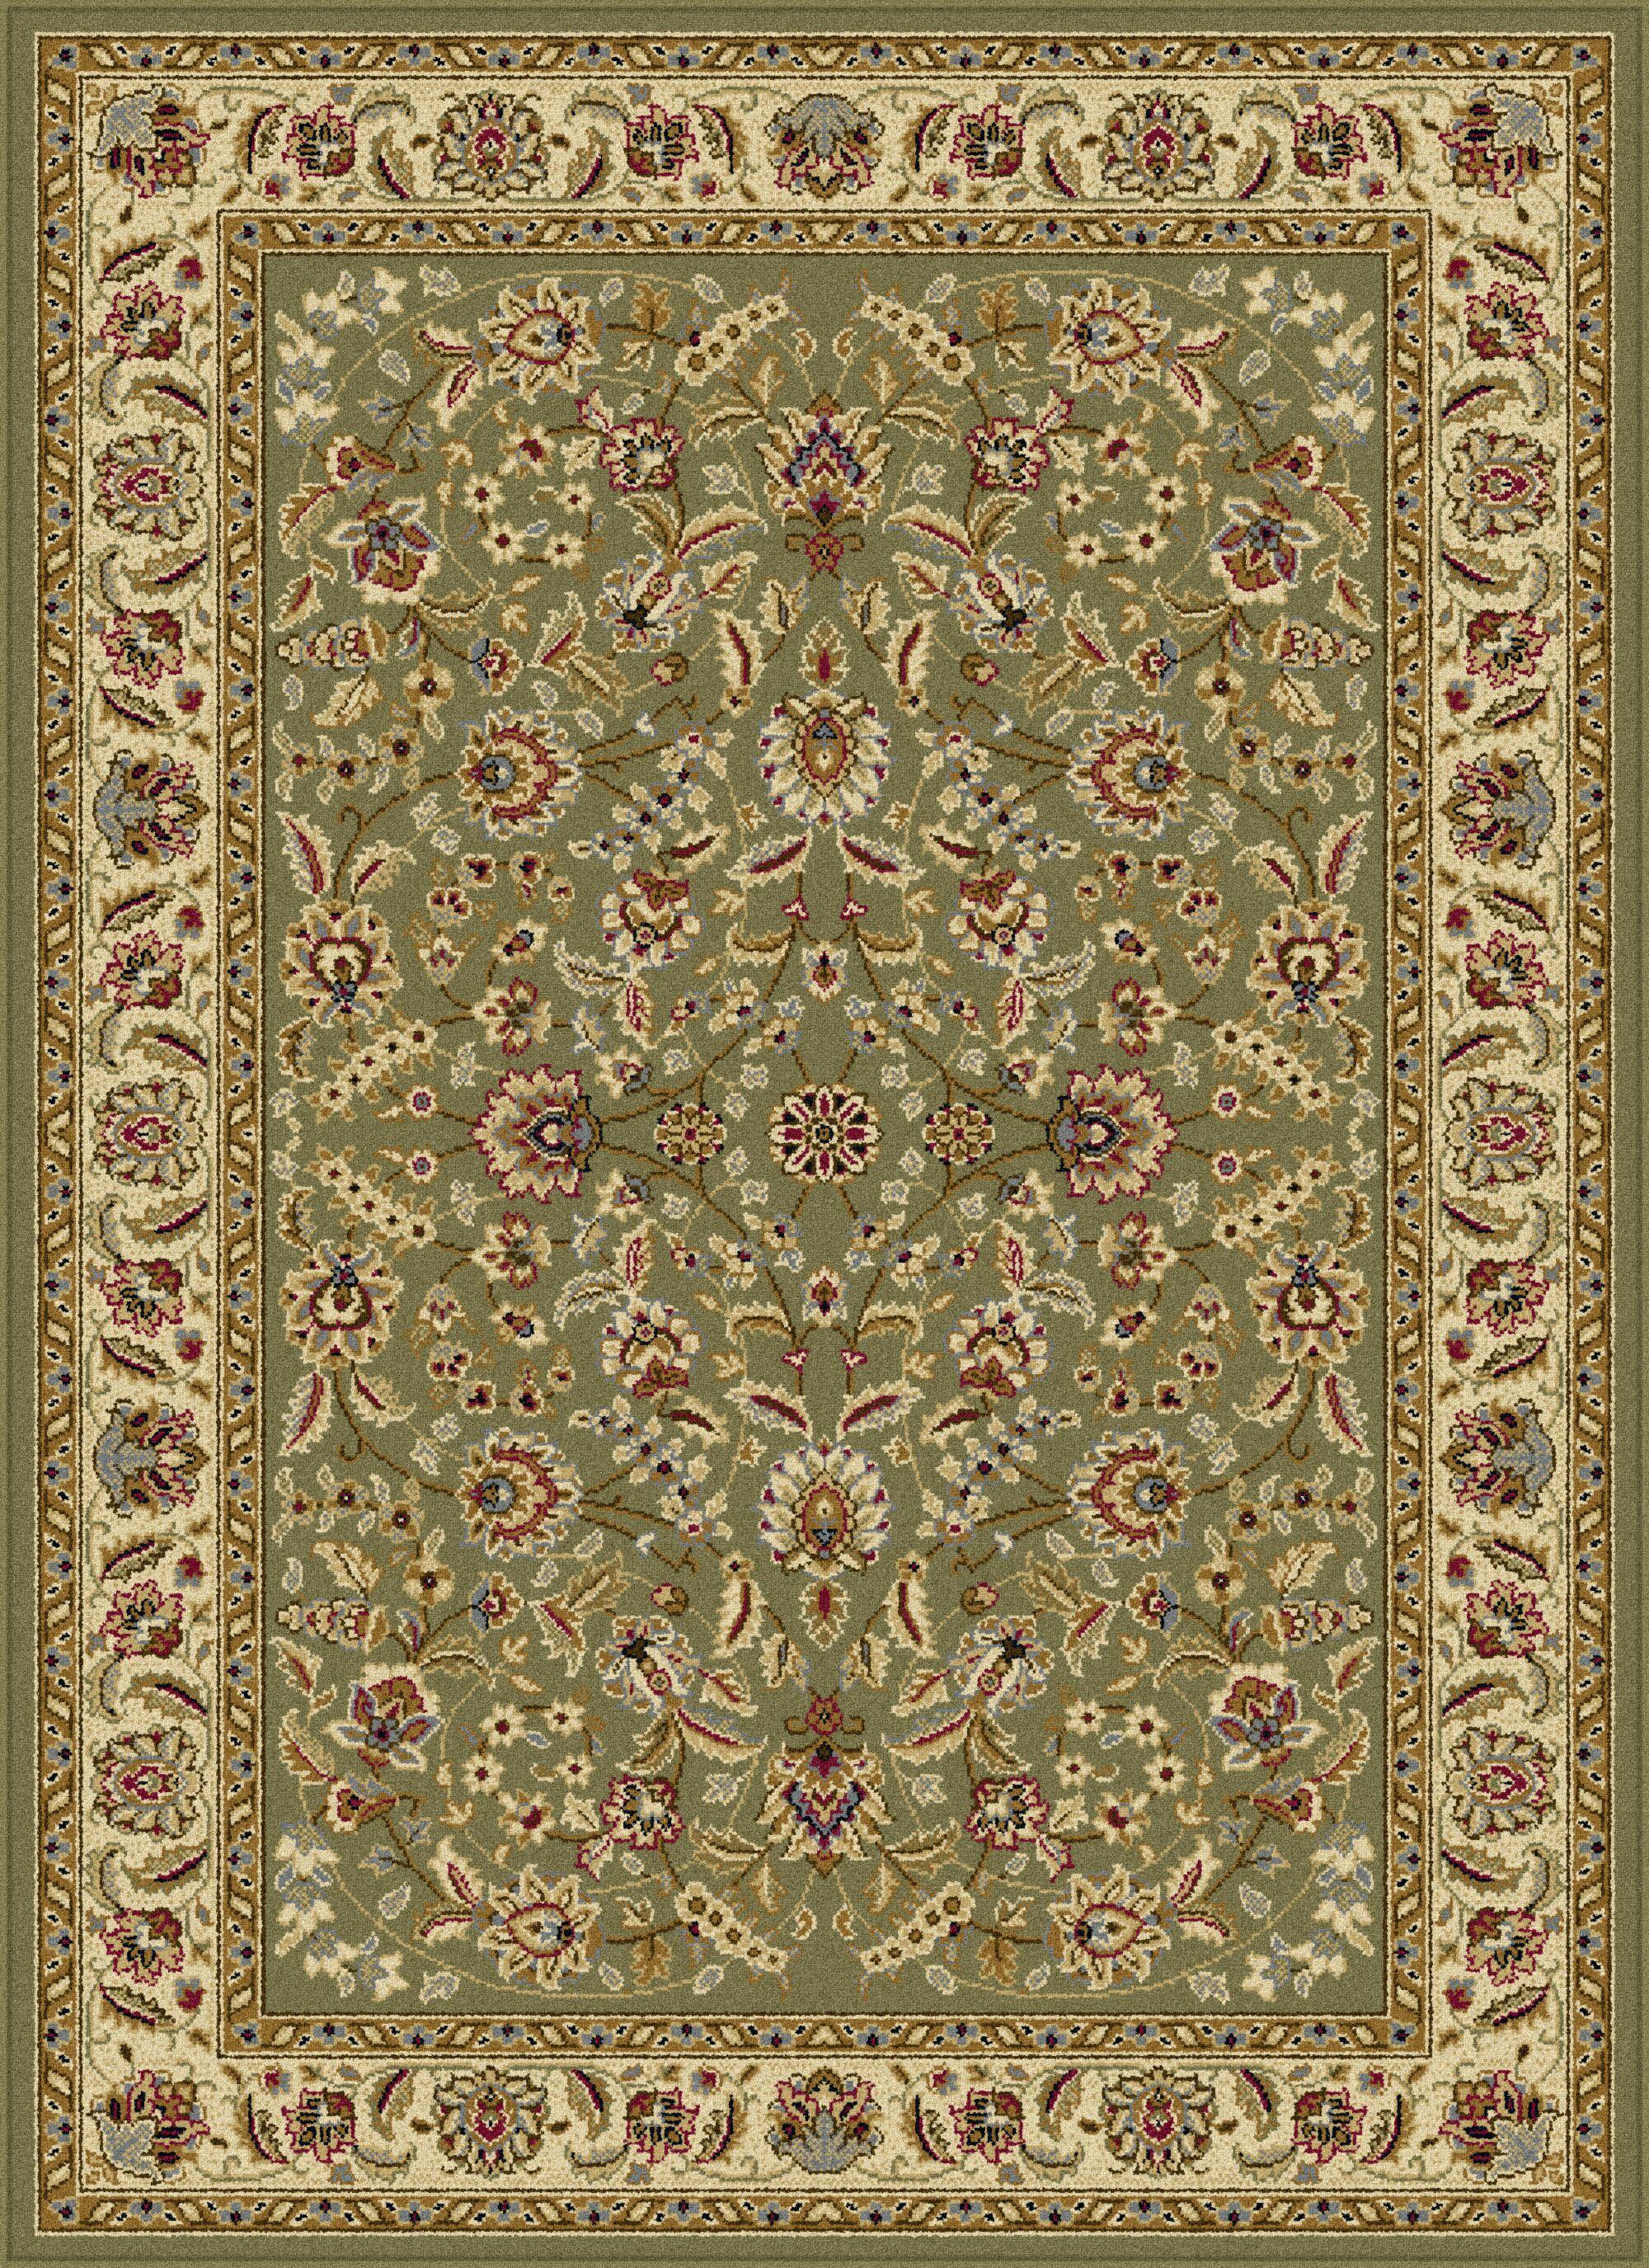 Larios Green Area Rug Rug Size: 7'6'' x 9'10''